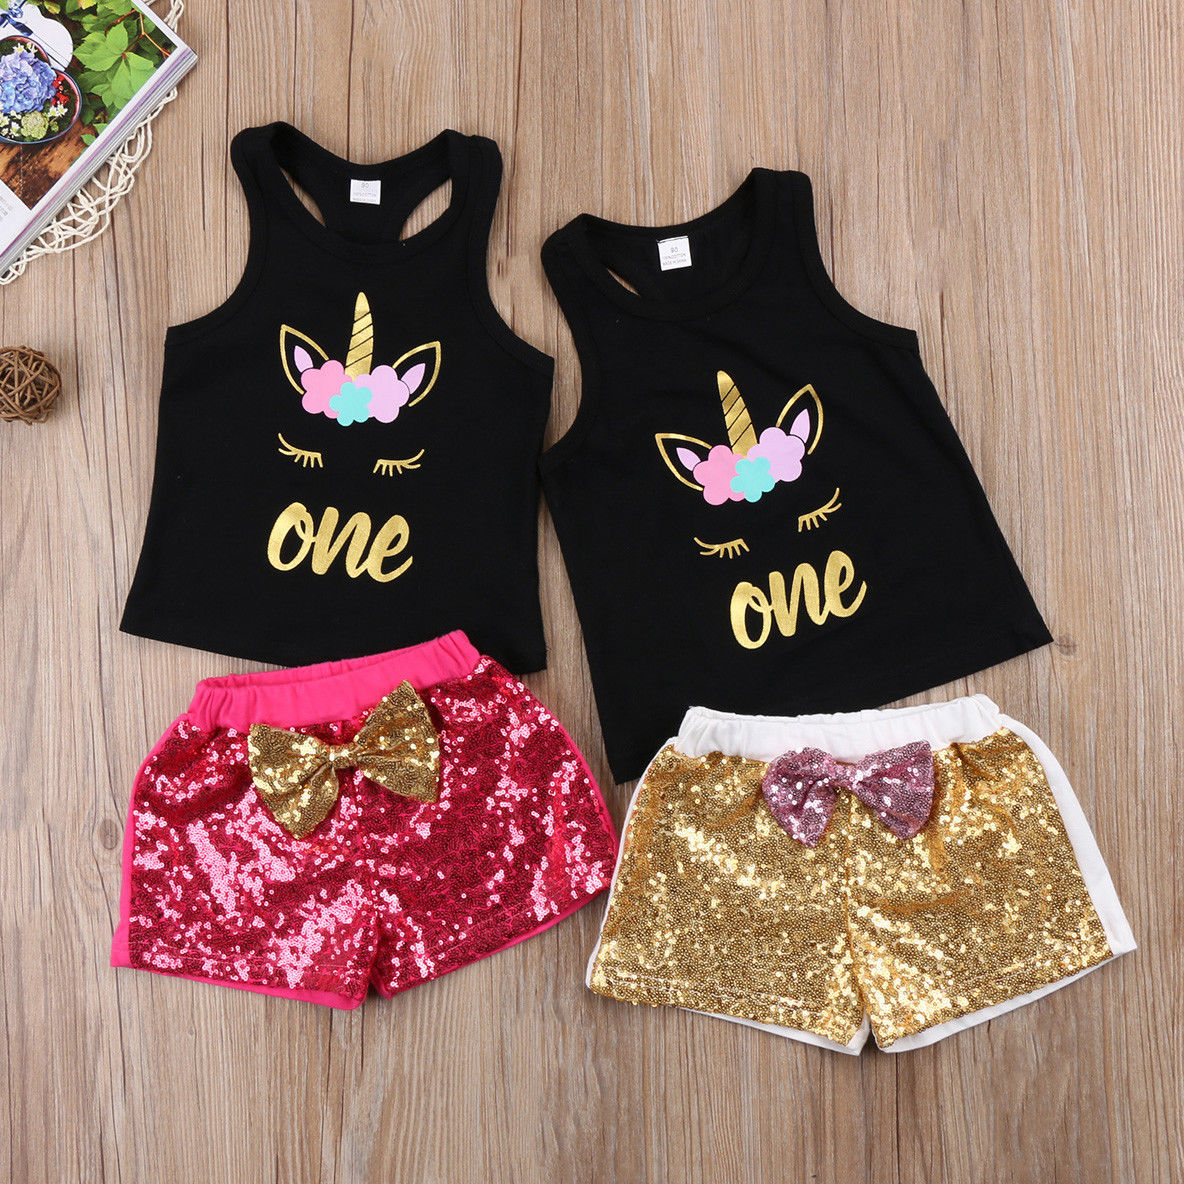 2017 Unicorn Toddler Kids Baby Girls Sleeveless T Shirt Tops Letters One VestShorts Sequins